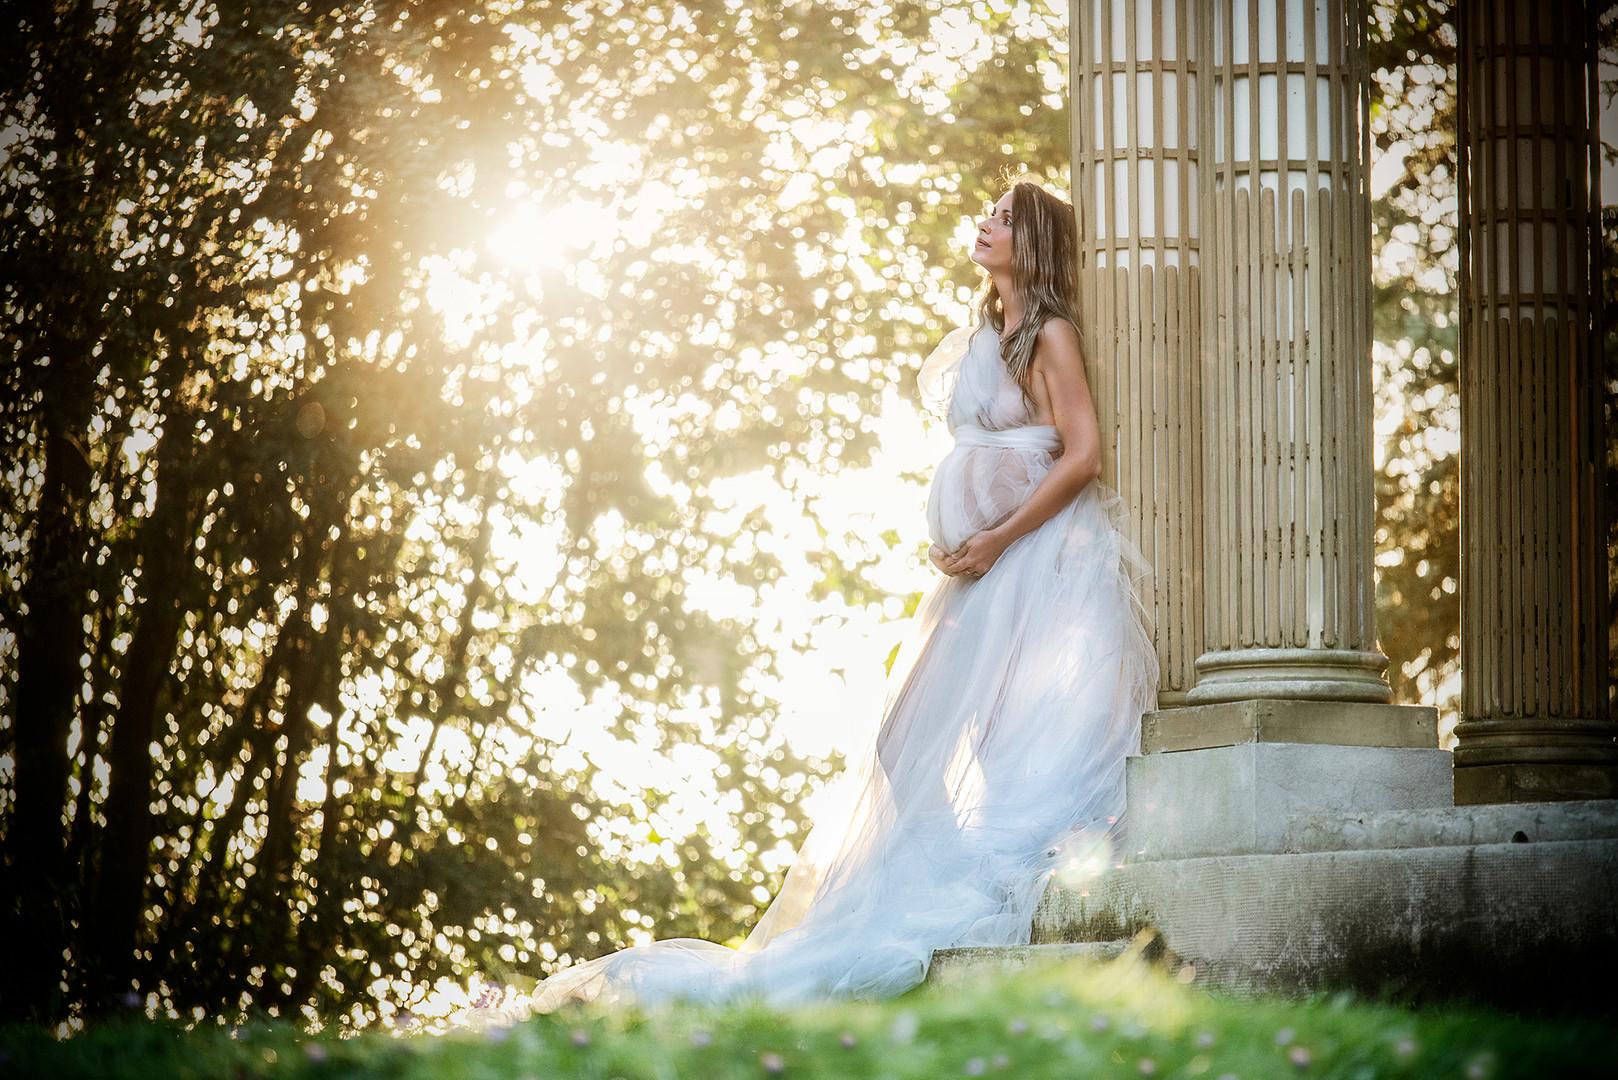 Maternité - Photographe grossesse Montpe